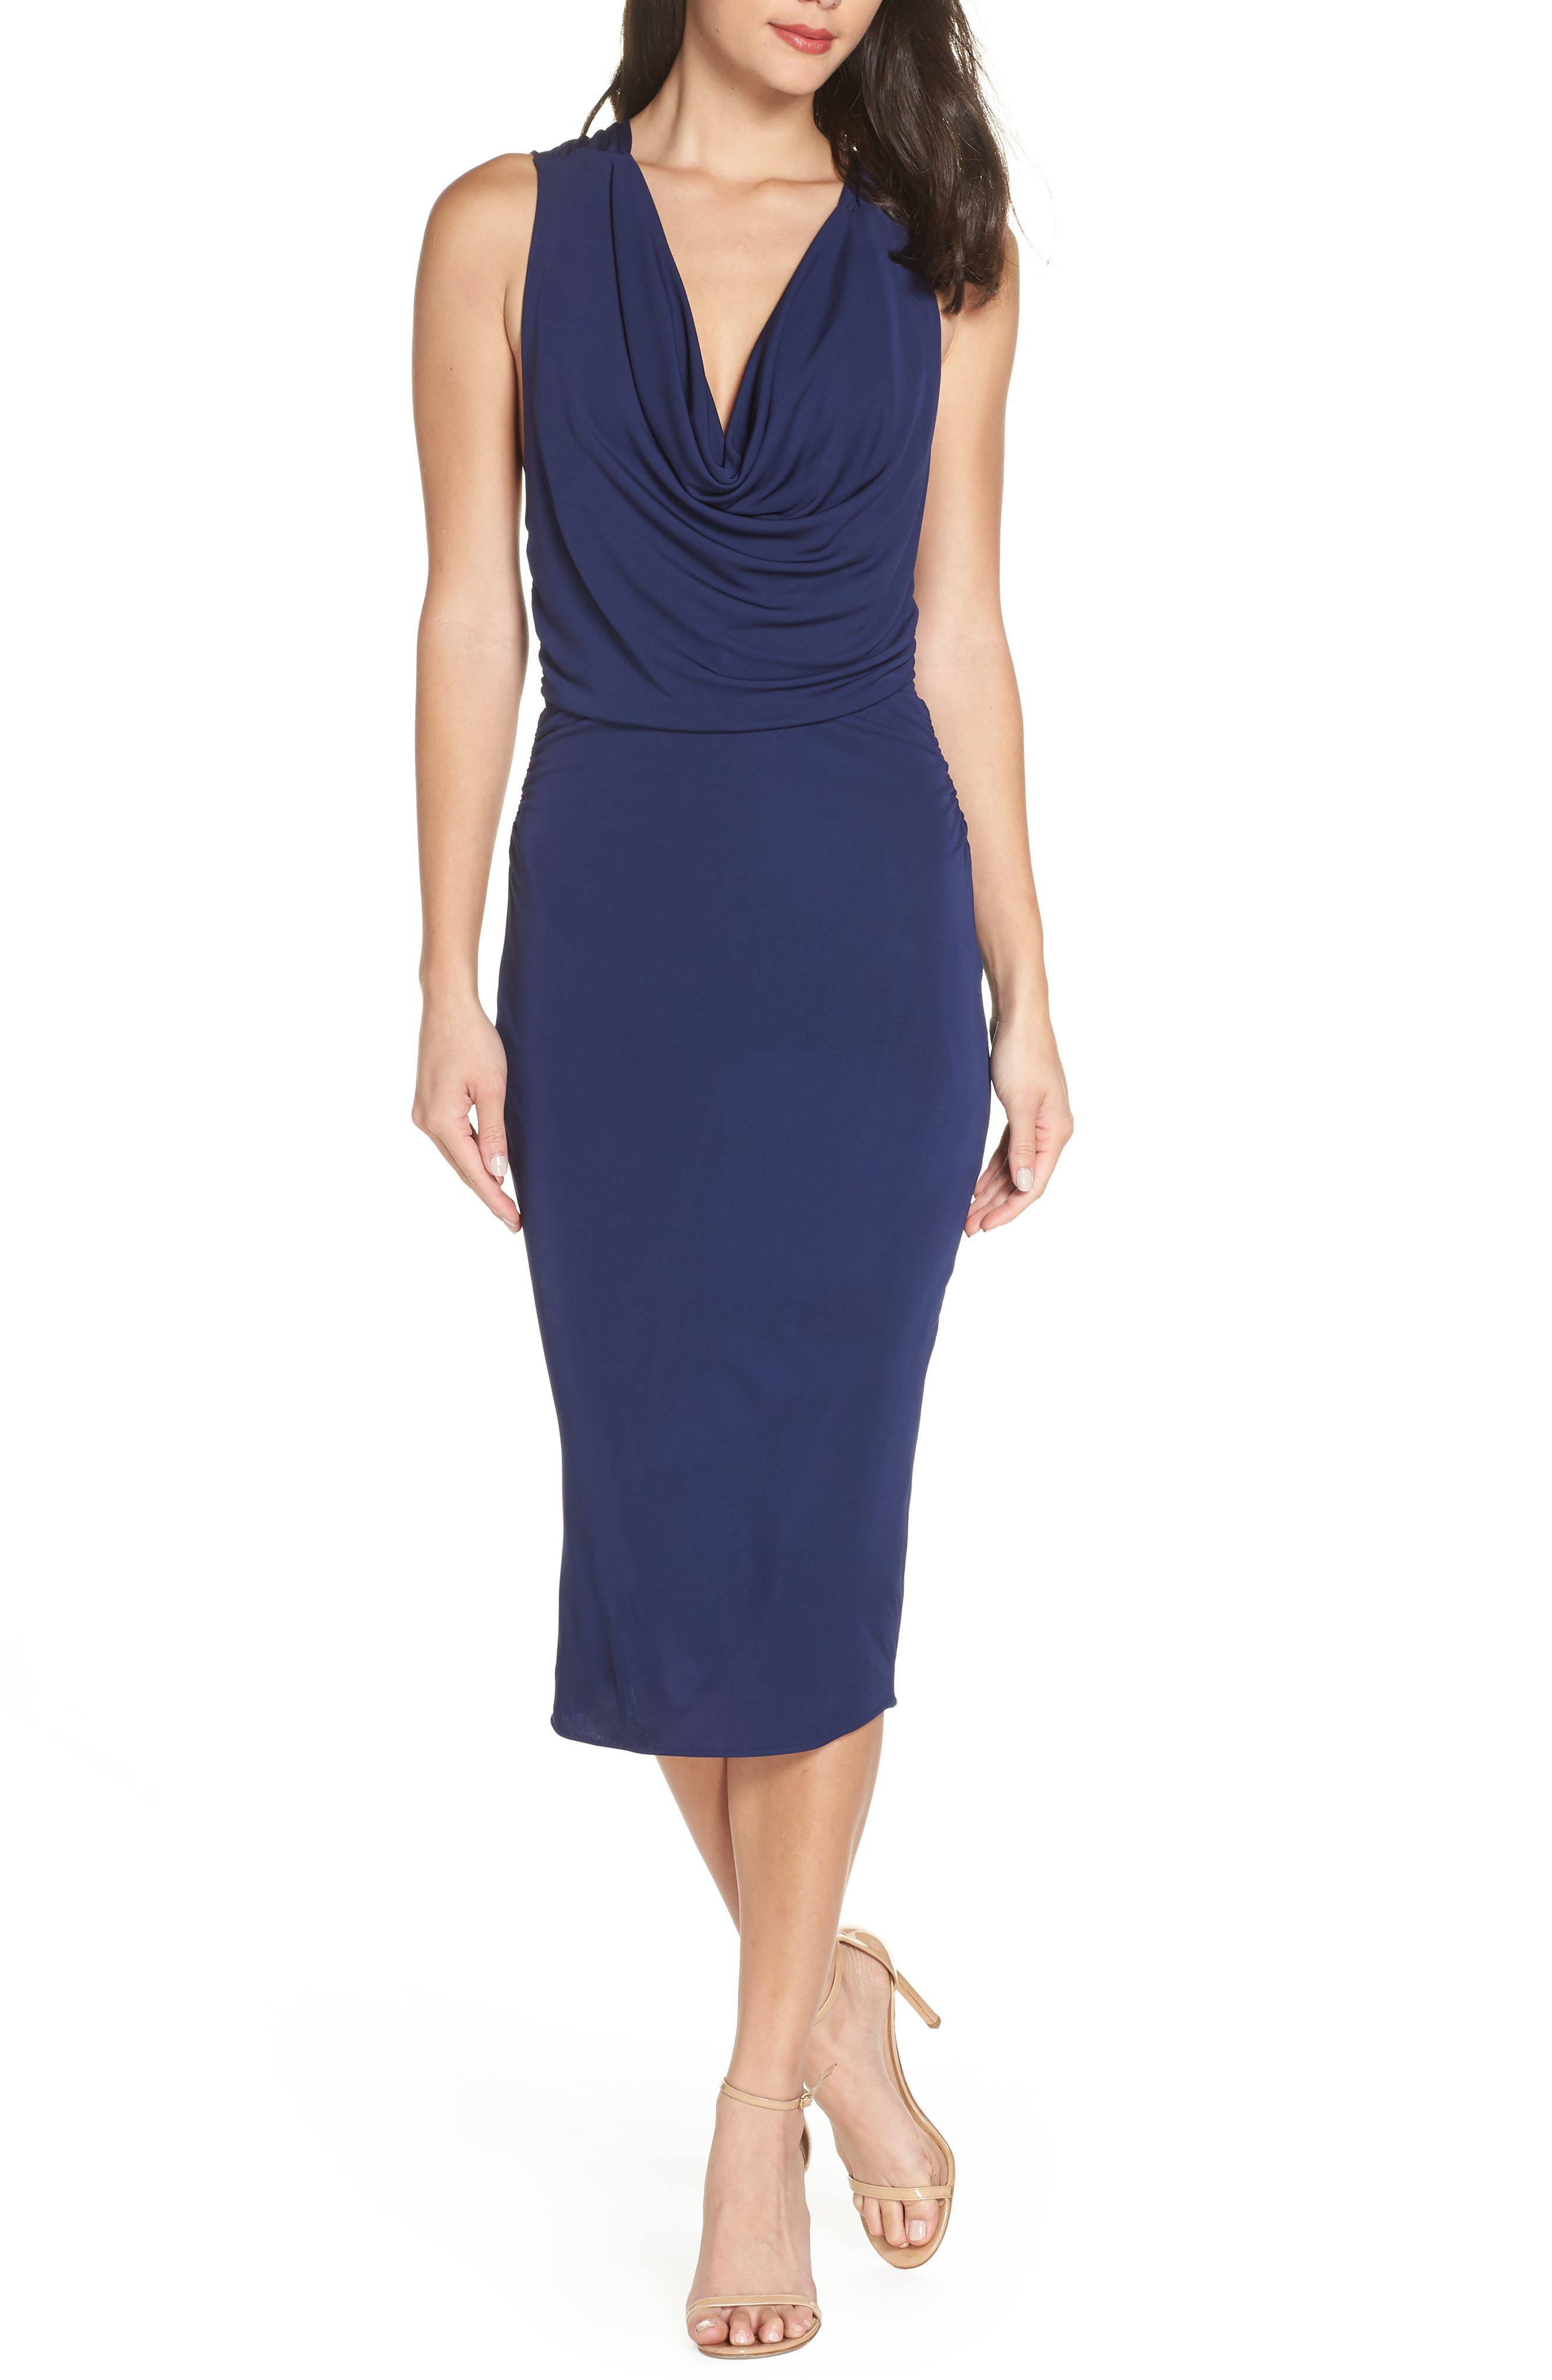 MARIA BIANCA NERO Elise Cowl Neck Sleeveless Dress in Dark Navy